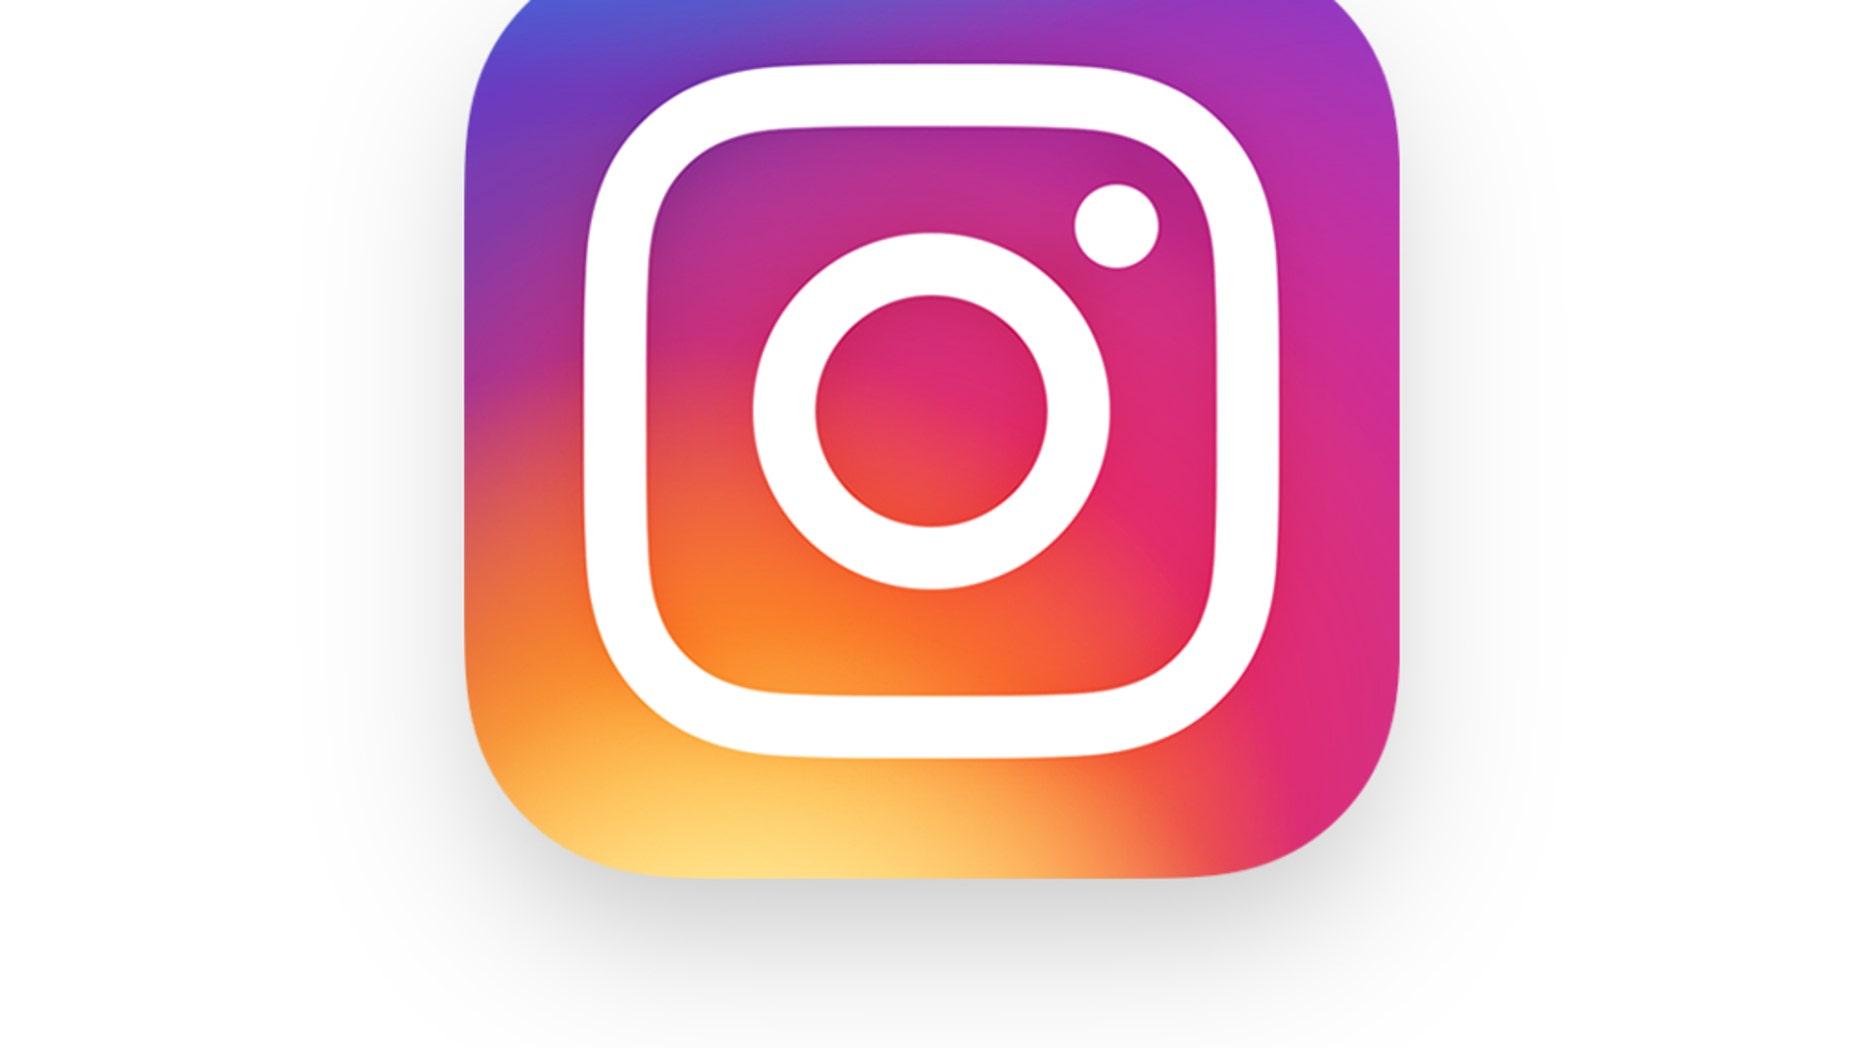 Instagram's new icon. (Instagram)